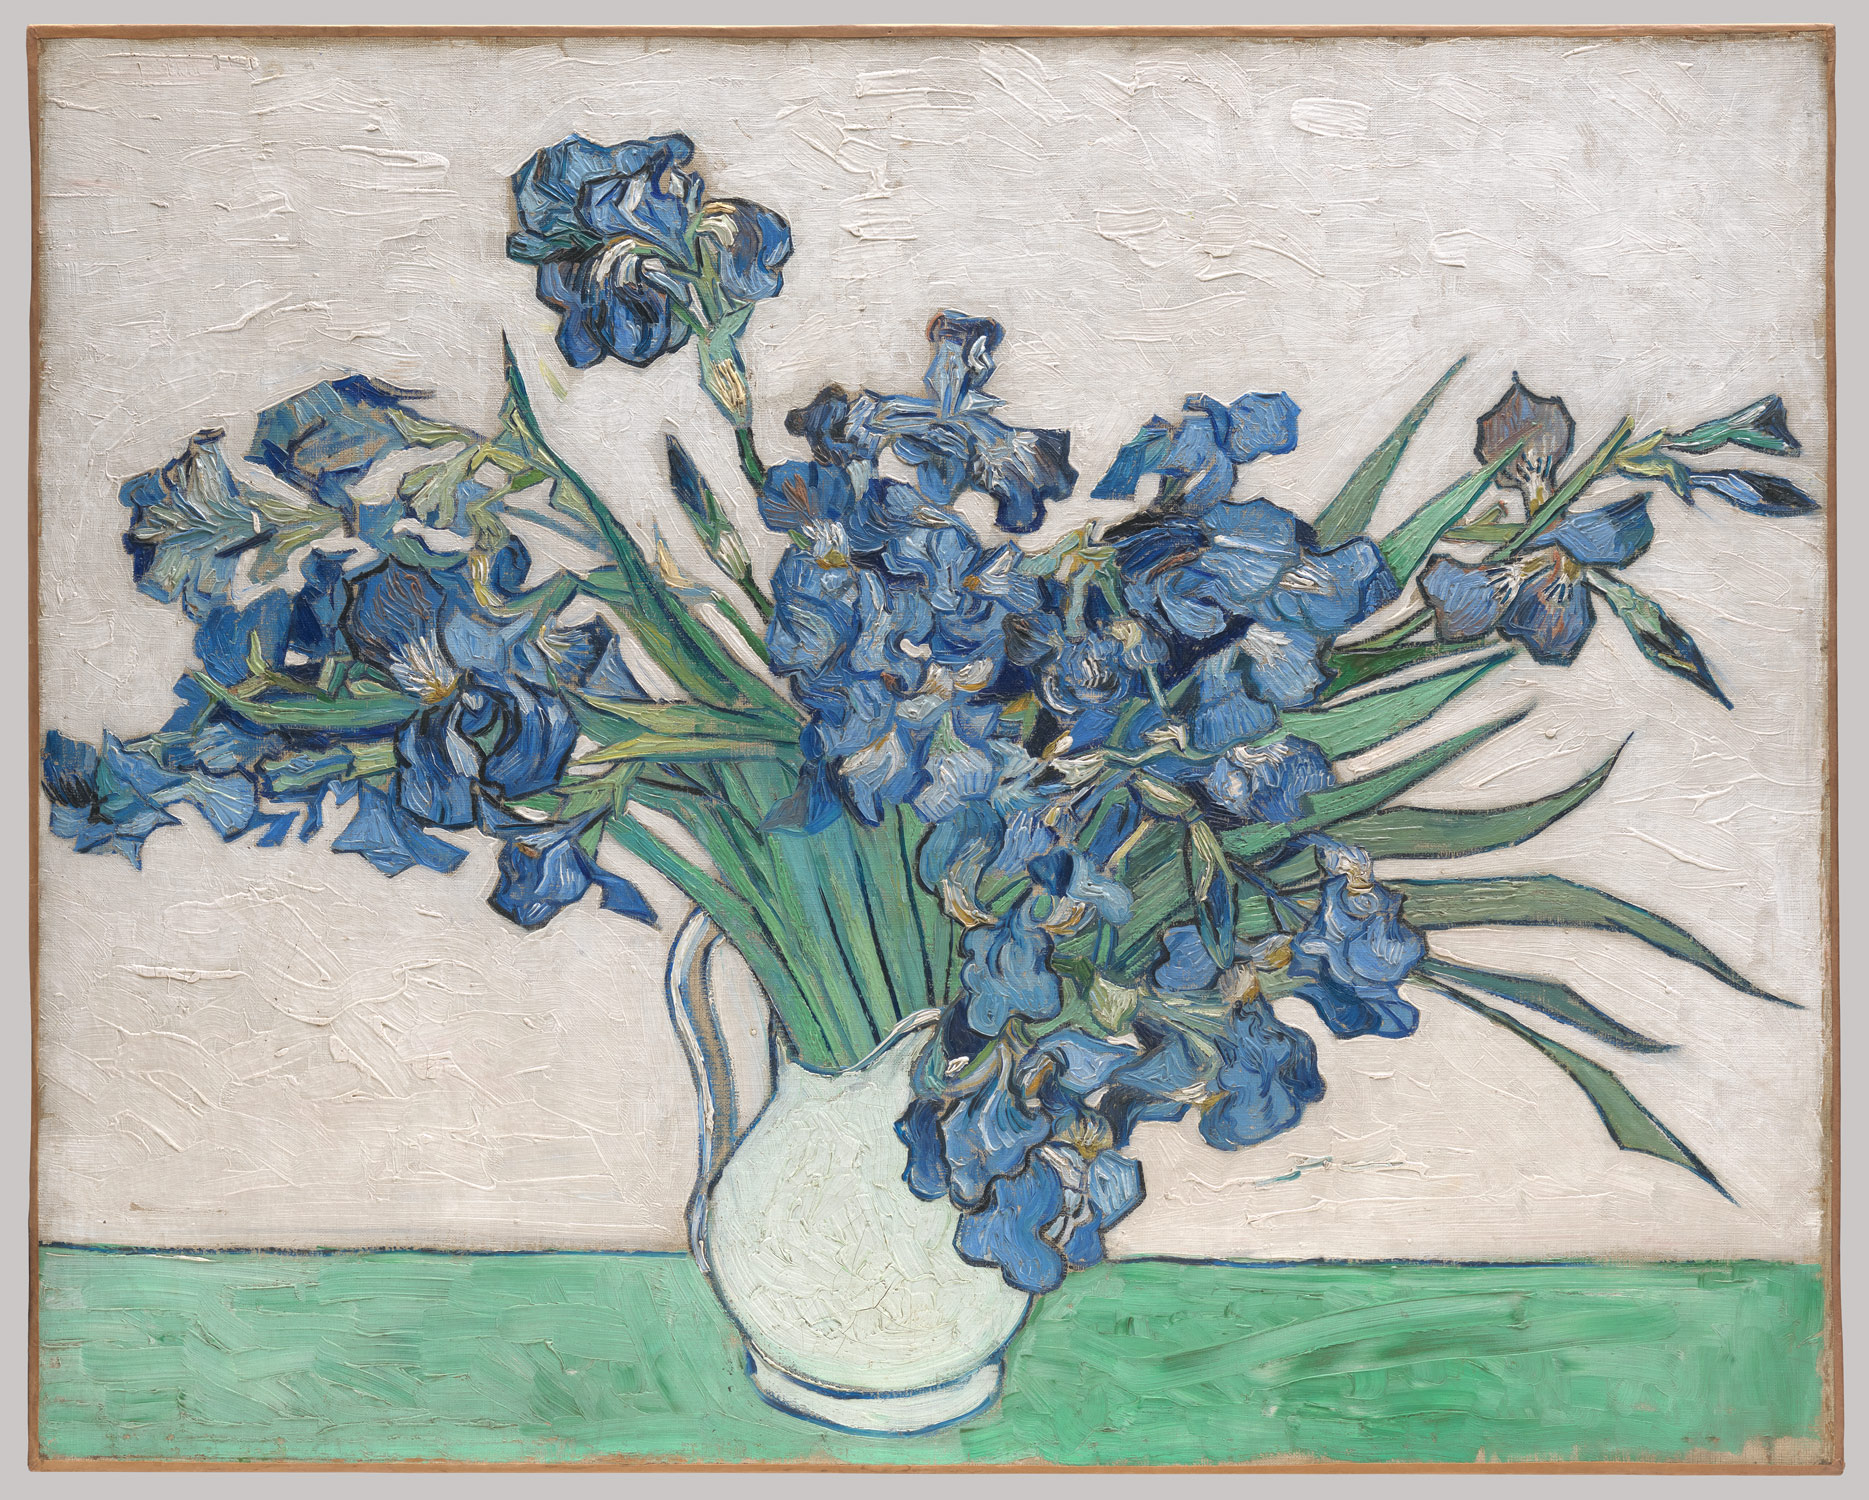 vincent van gogh essay heilbrunn timeline of art roses roses acircmiddot irises irises